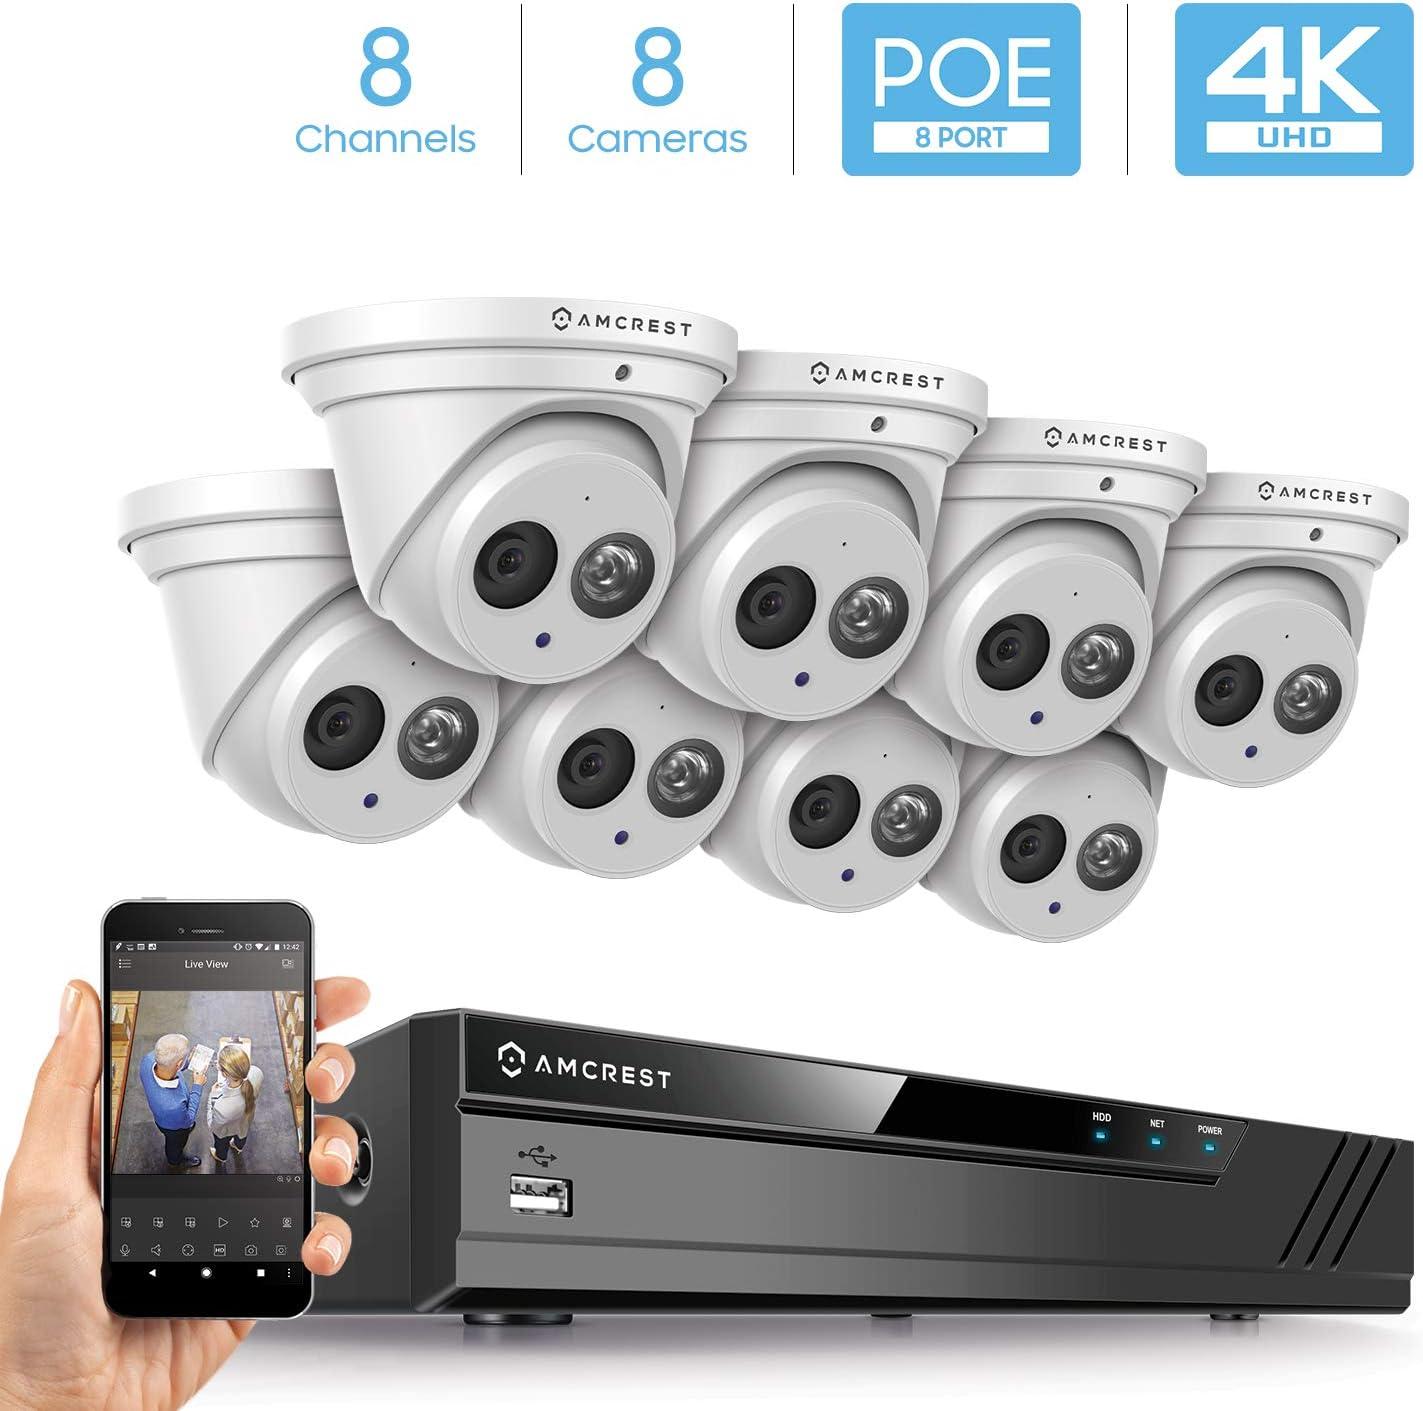 Amcrest 4K Security Camera System w 4K 8CH PoE NVR, 8 x 4K 8-Megapixel IP67 Weatherproof Metal Turret Dome POE IP Cameras 3840×2160 , 2.8mm Lens, NV4108E-IP8M-T2499EW8 White